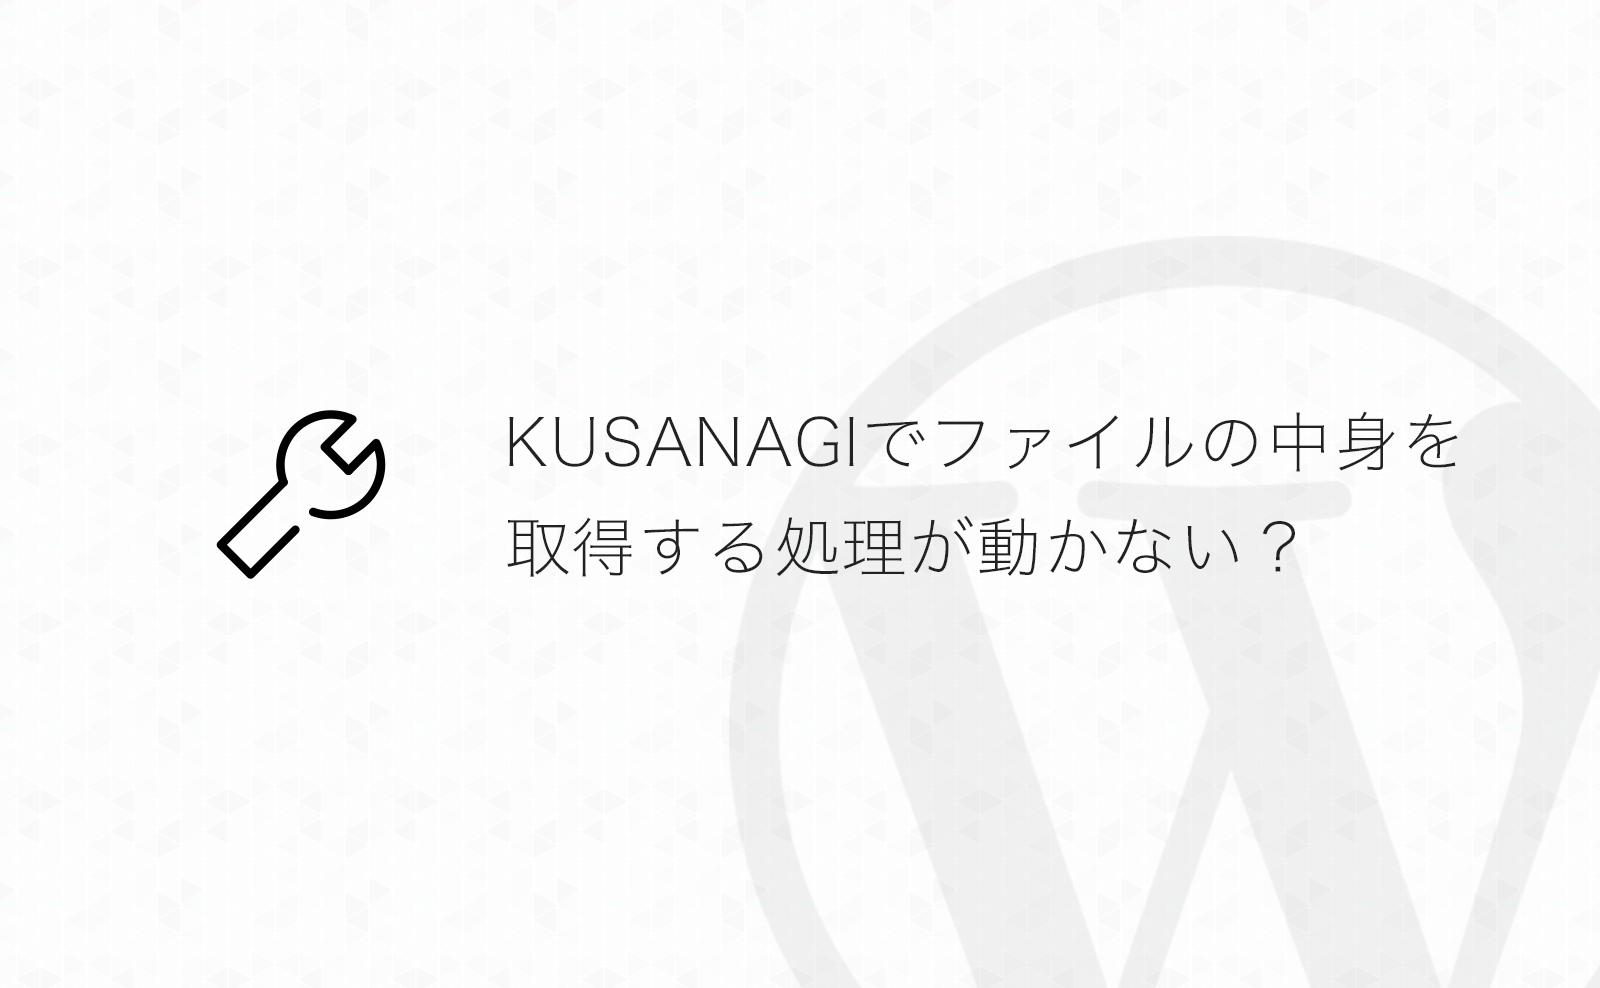 【WordPress】KUSANAGIでWP_Filesystemが動作せずファイルの内容を取得できないときの対処方法